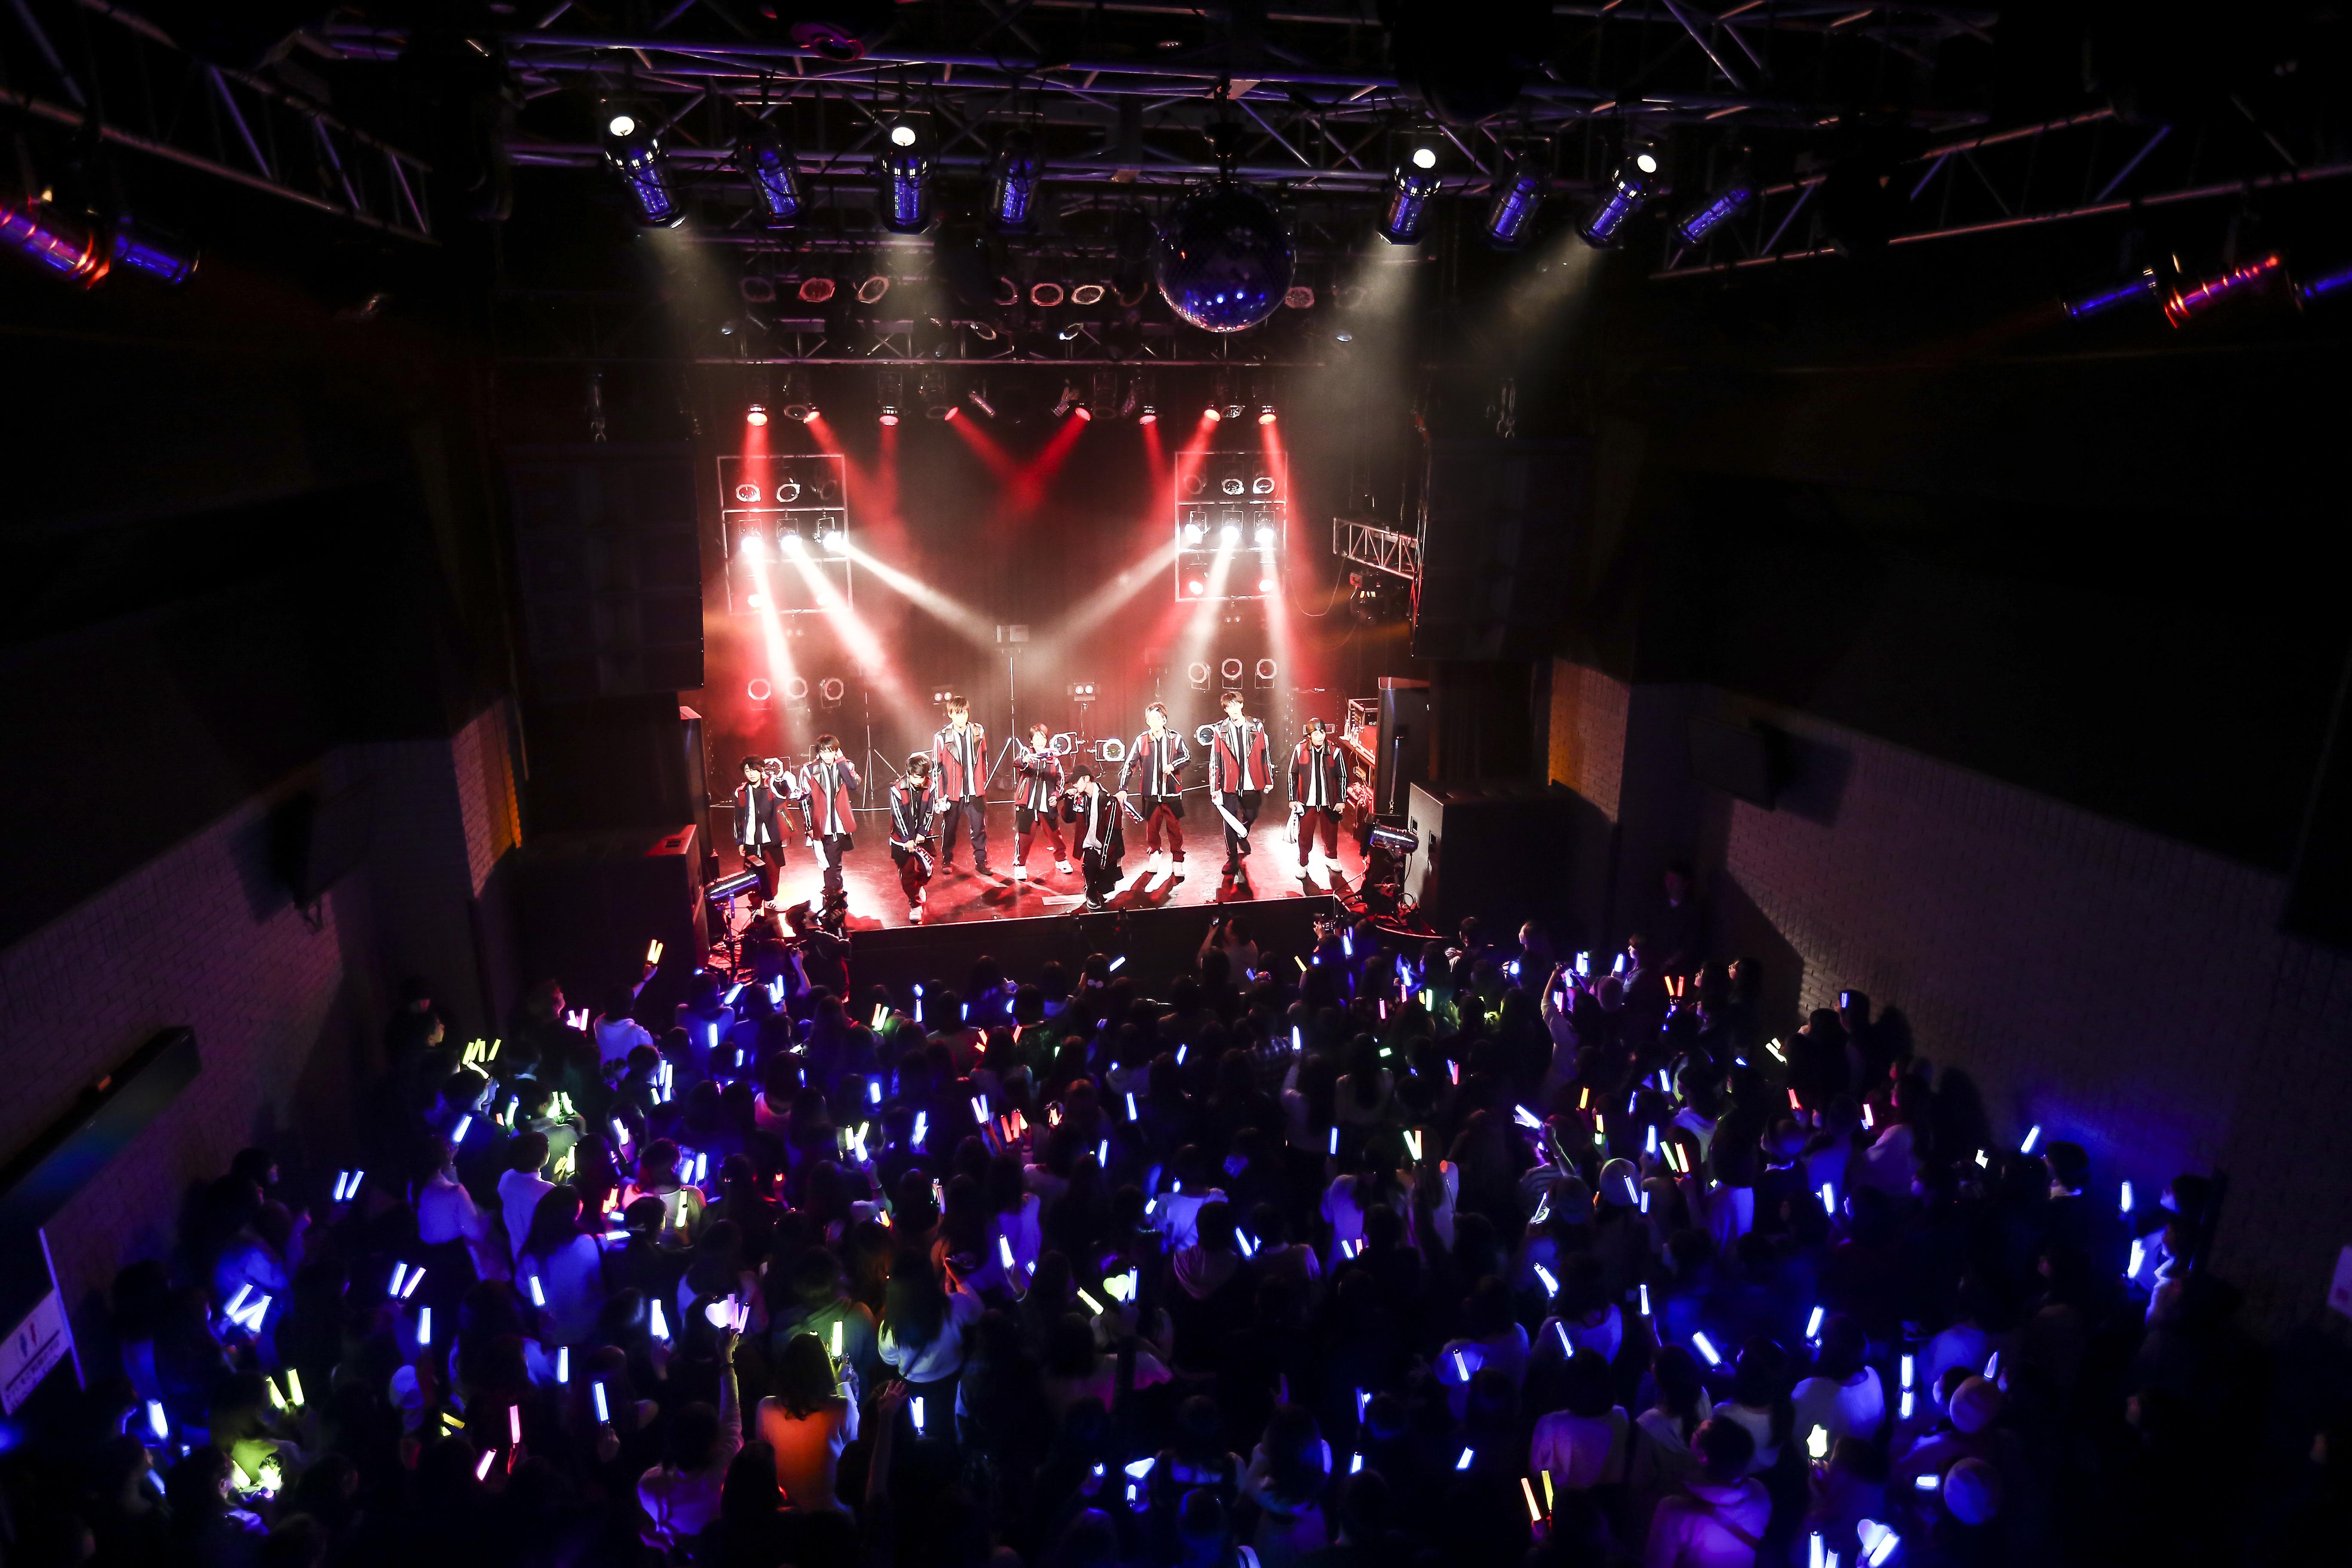 http://c.okmusic.jp/news_images/images/1777162/original.jpg?1477812903